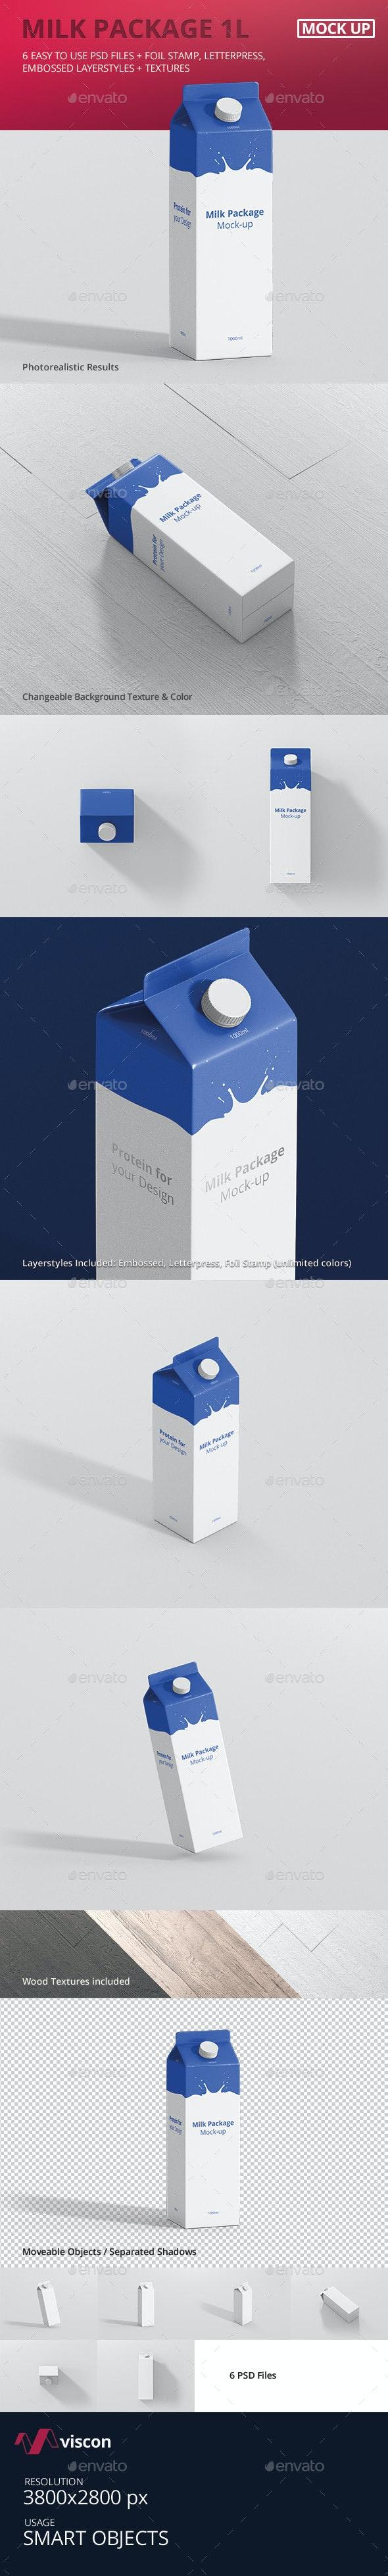 Juice / Milk Mockup - 1L Carton Box - Food and Drink Packaging